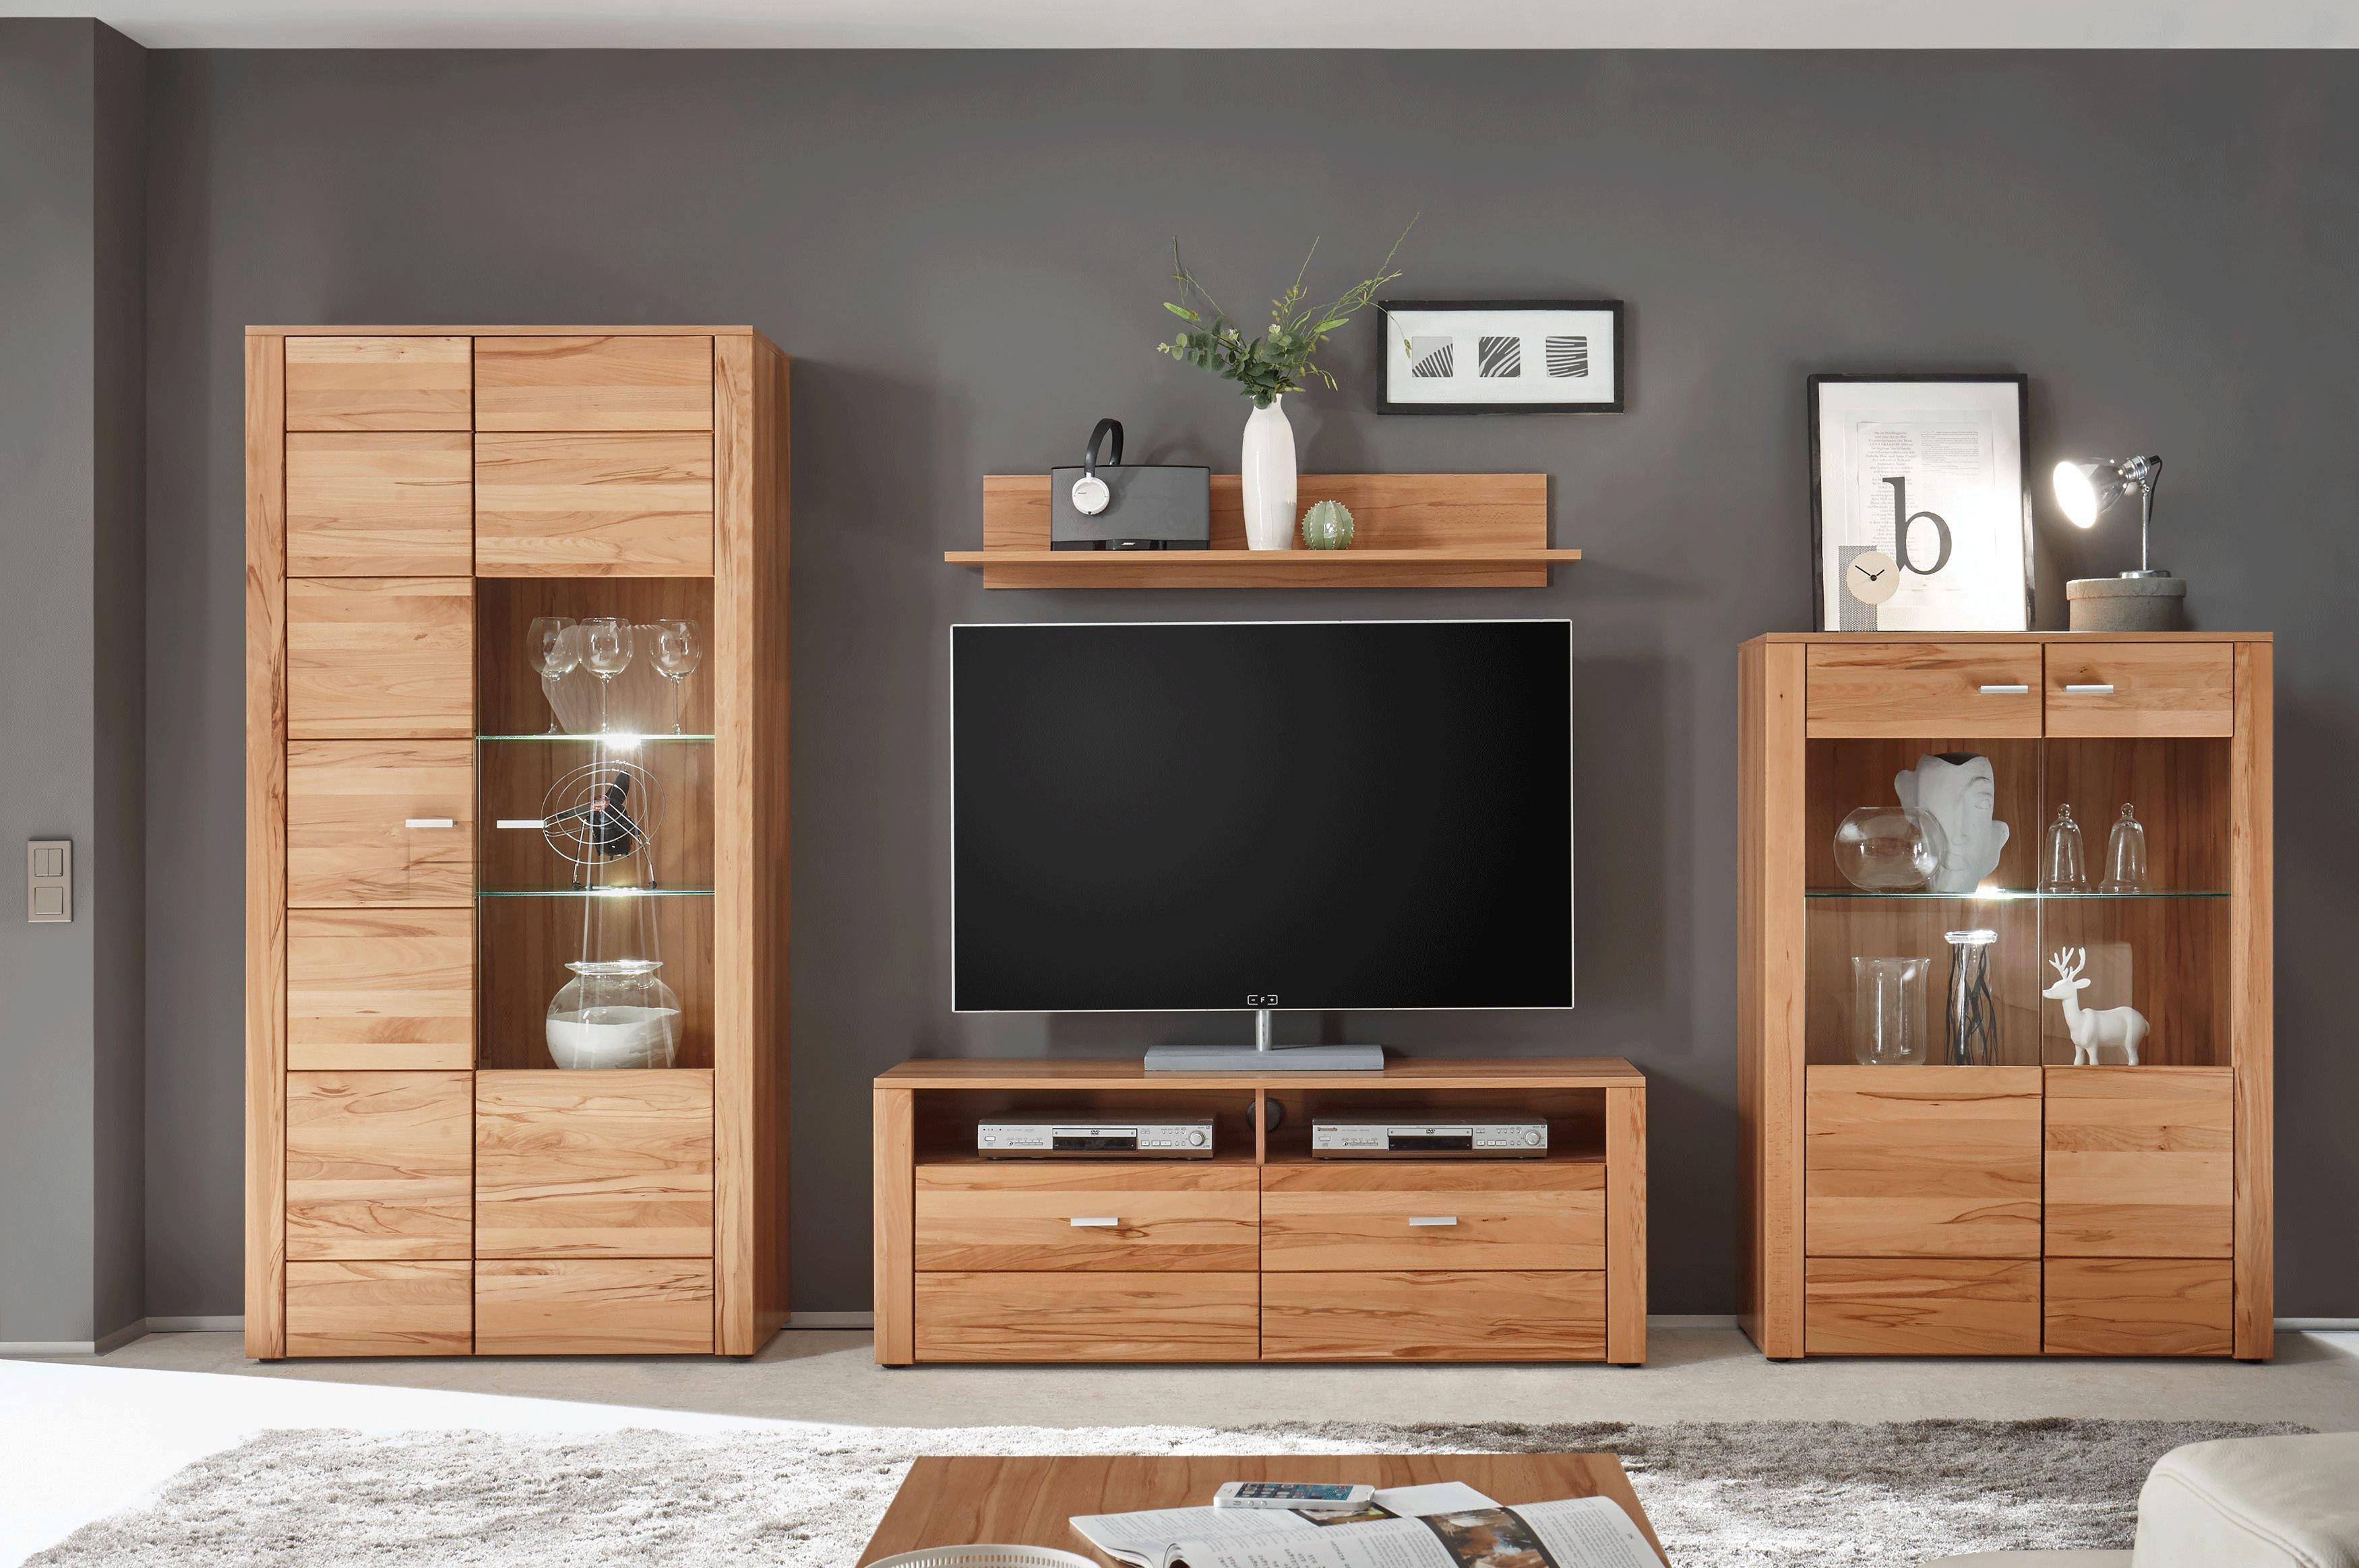 wohnwand buche teilmassiv minimalist0. Black Bedroom Furniture Sets. Home Design Ideas